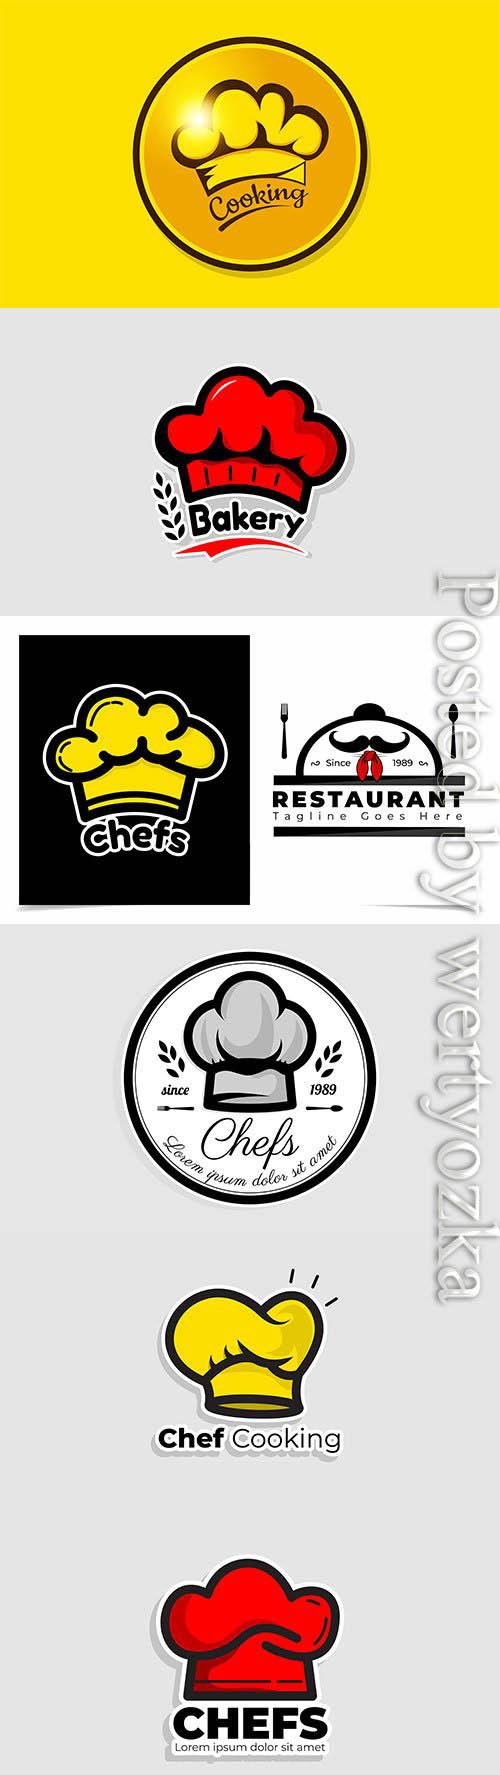 Chef hat logo template, vector restaurant logo design inspiration